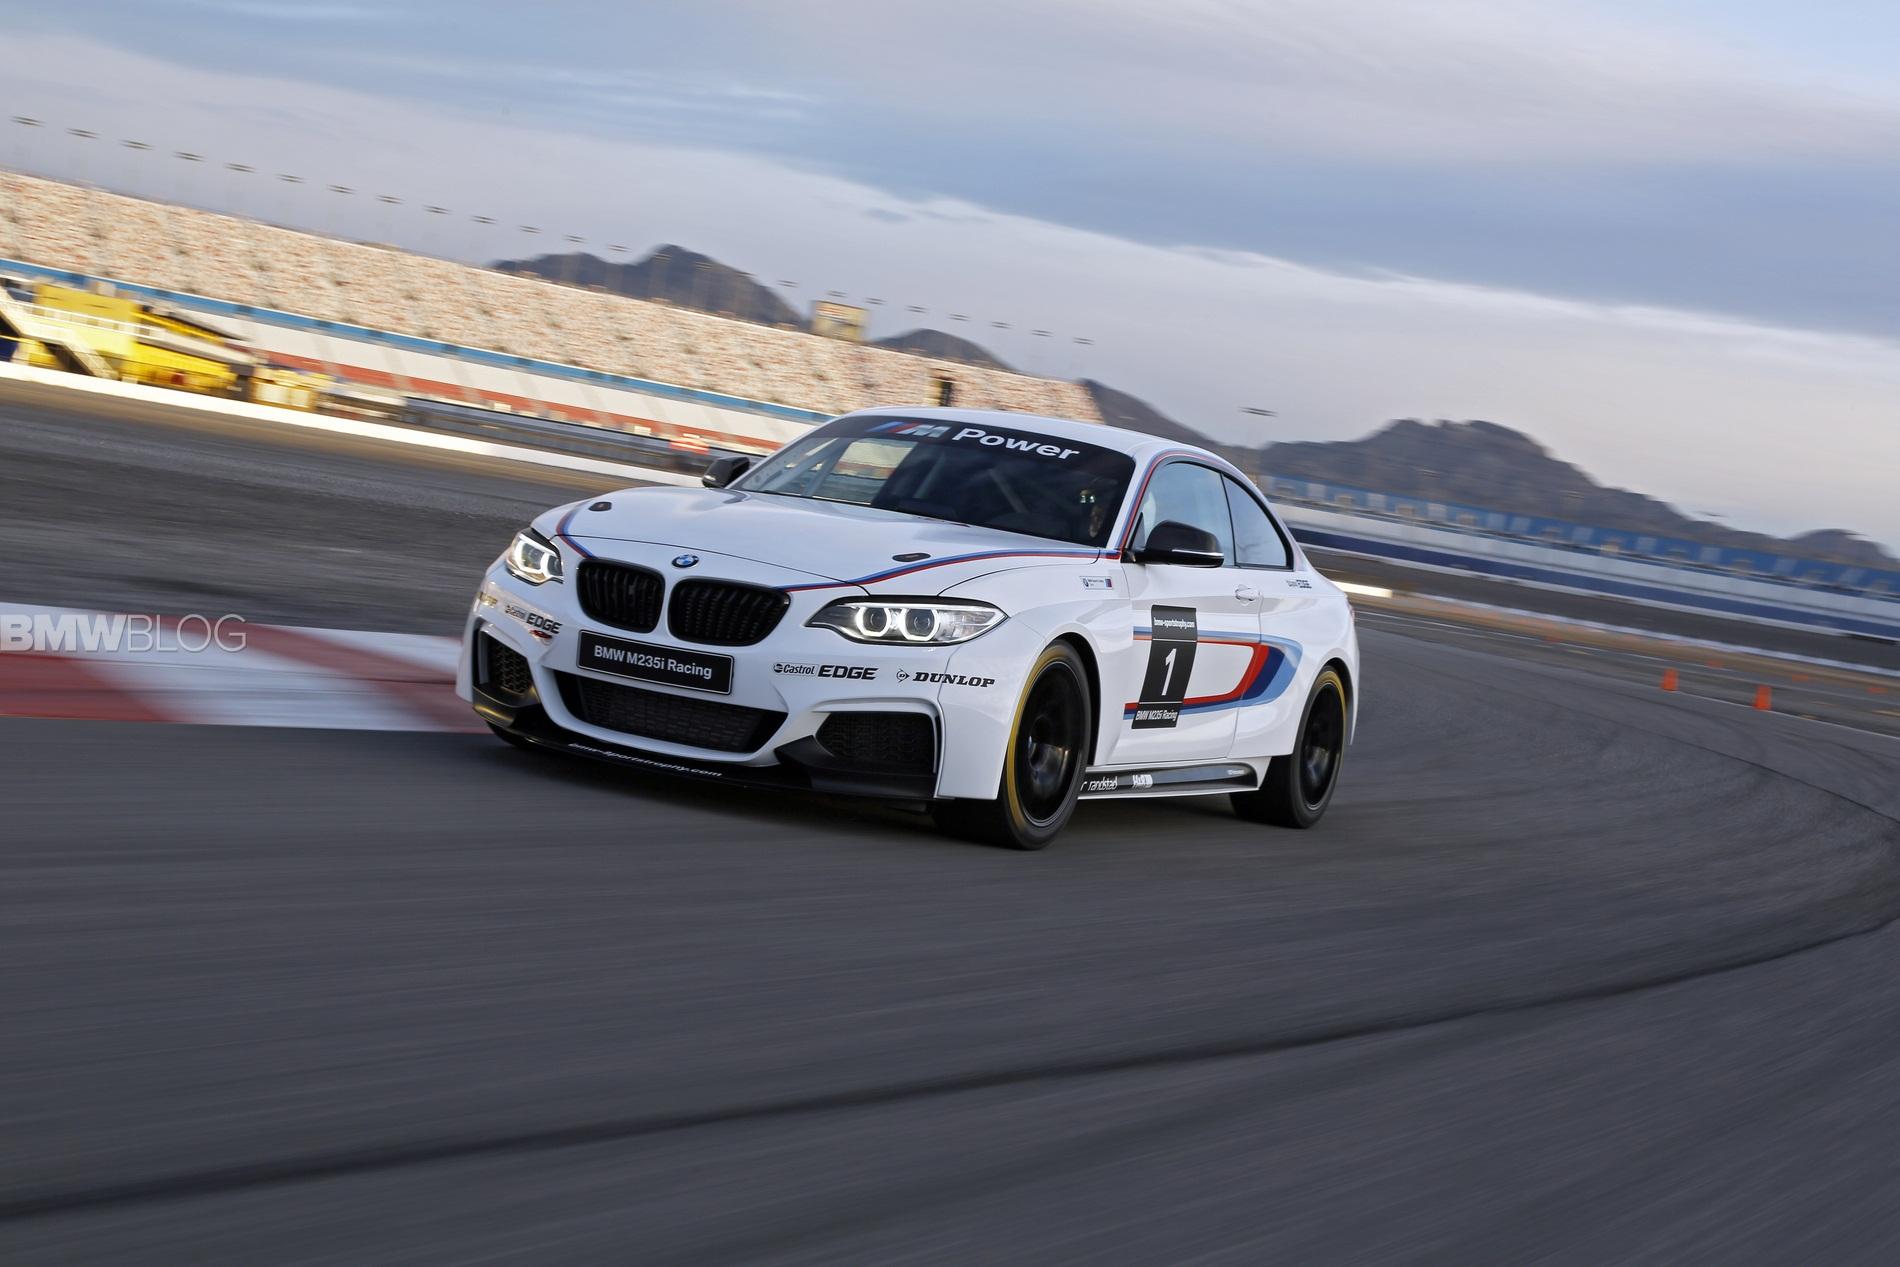 bmw m235i race car track 01